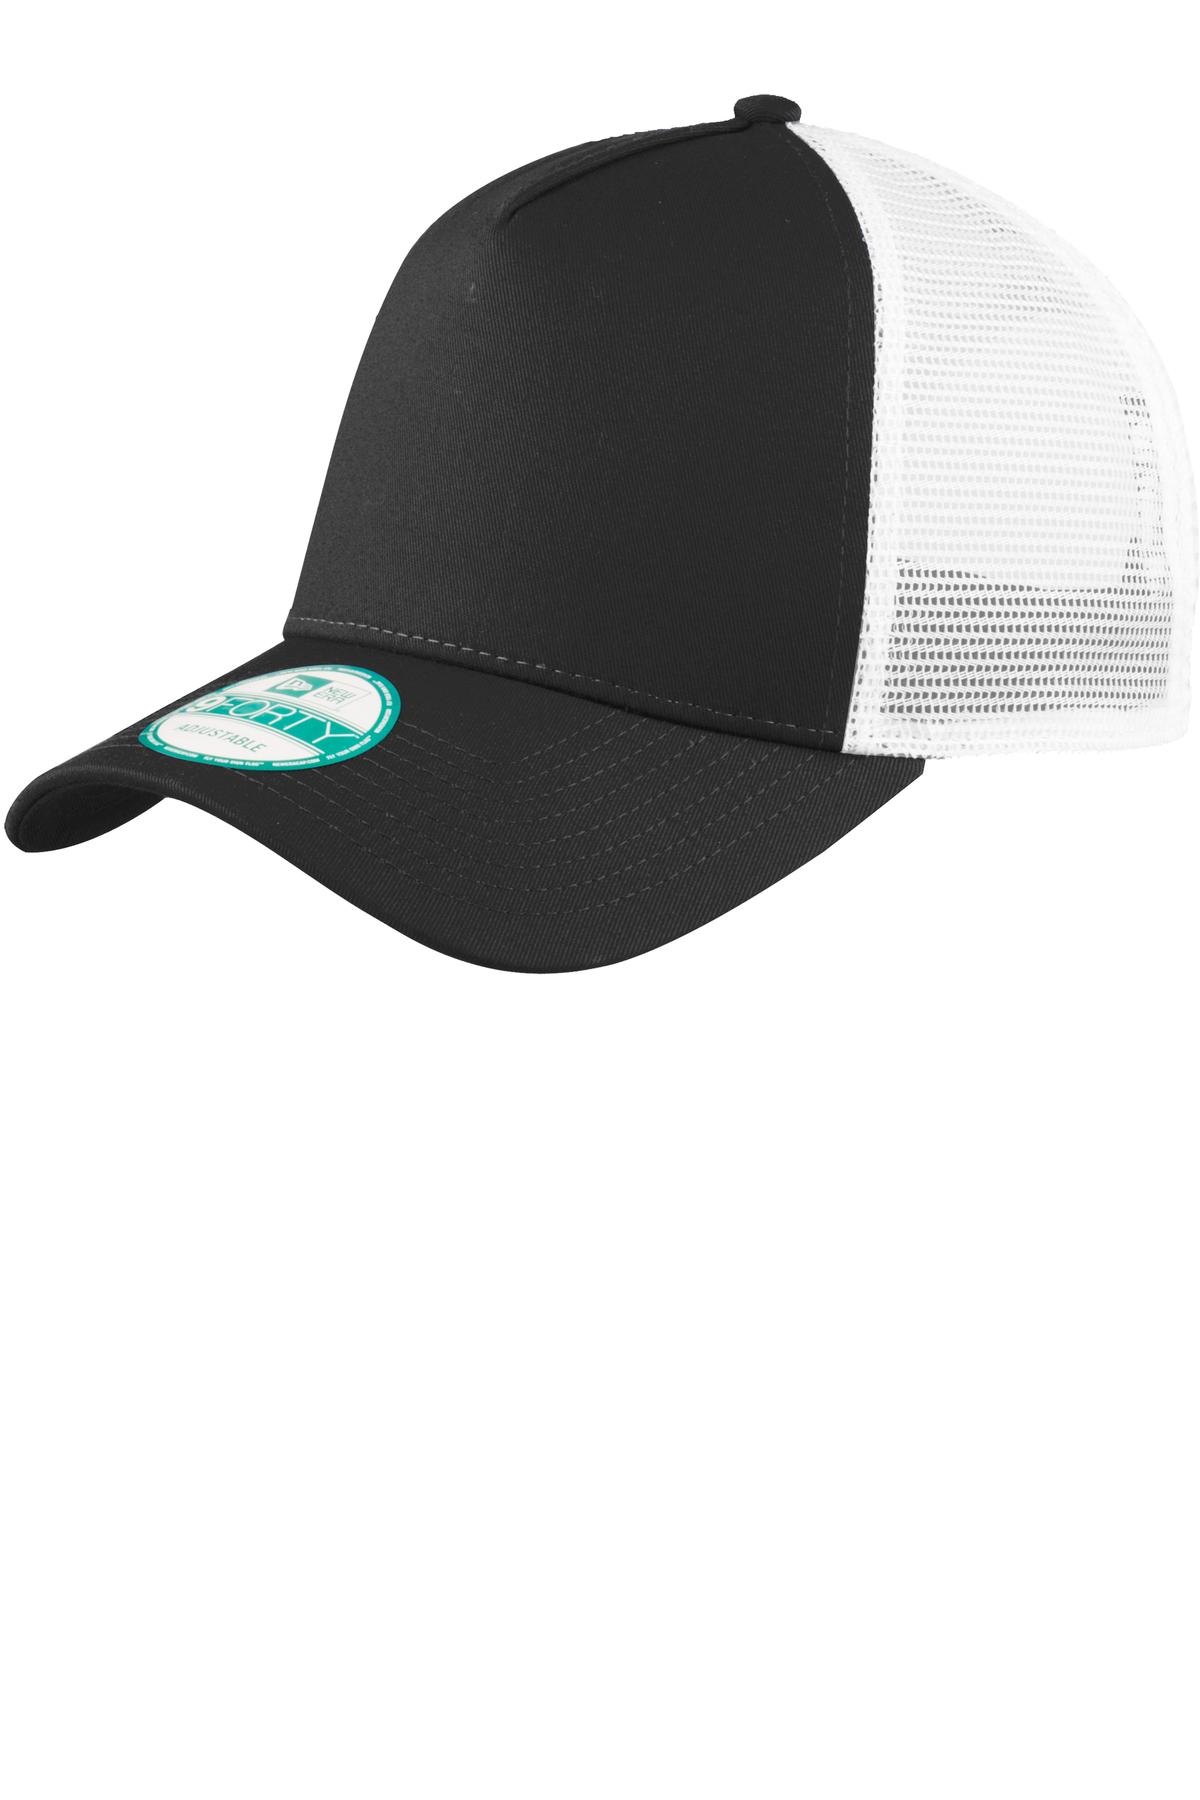 589b8eb51a5c6 New Era® NE205 - Snapback Trucker Cap - Headwear